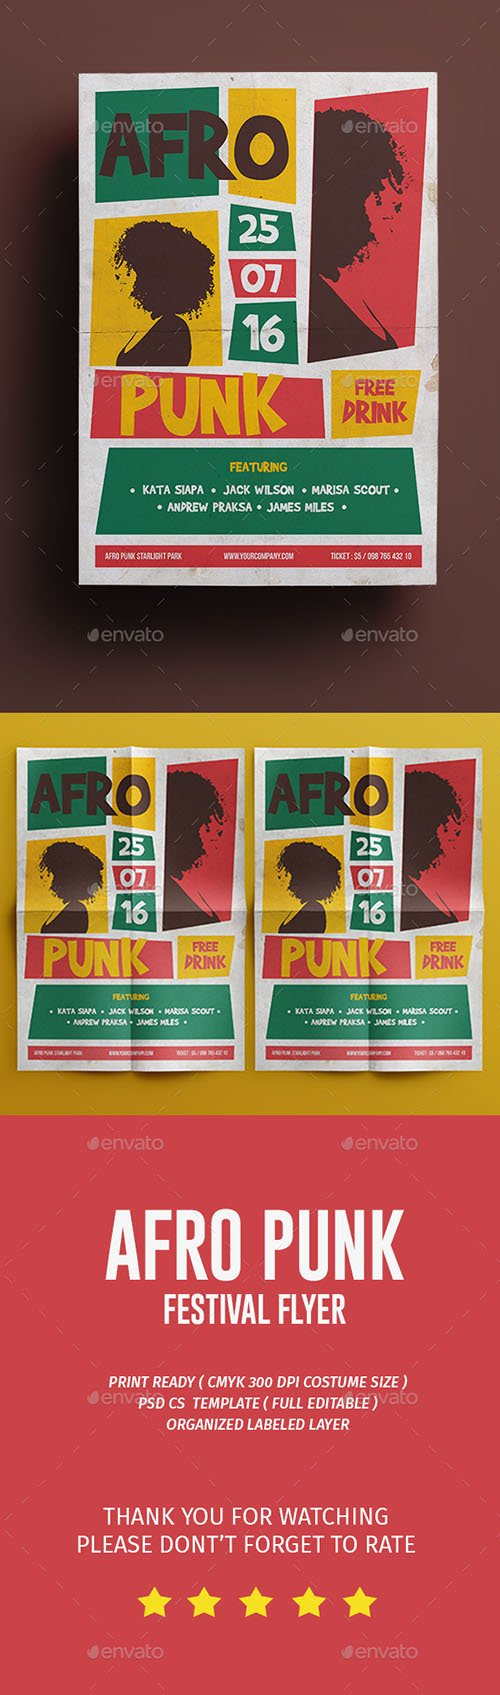 Afro Punk Flyer 17136098